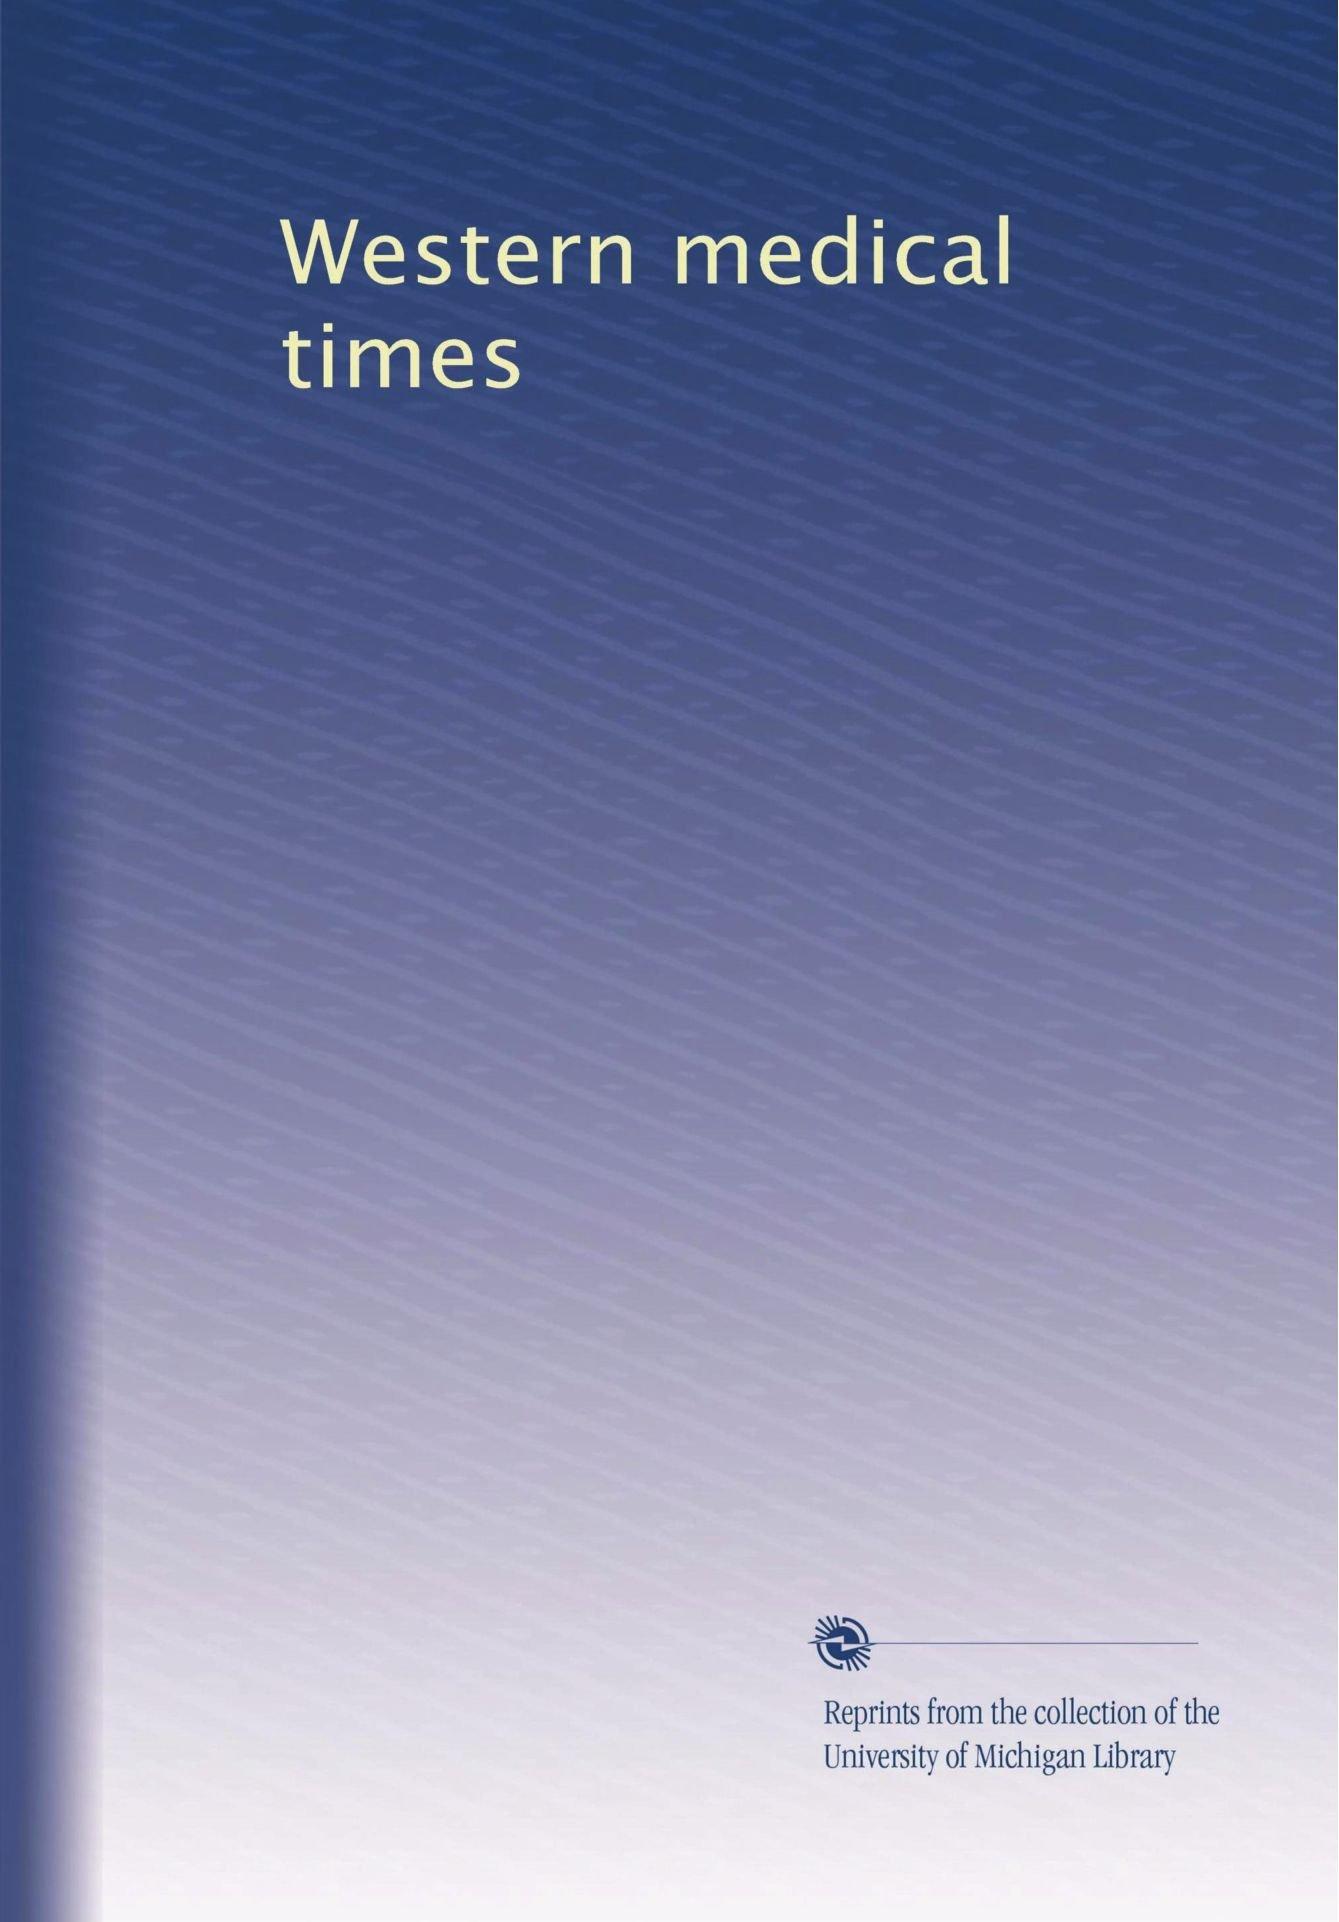 Download Western medical times (Volume 46) PDF